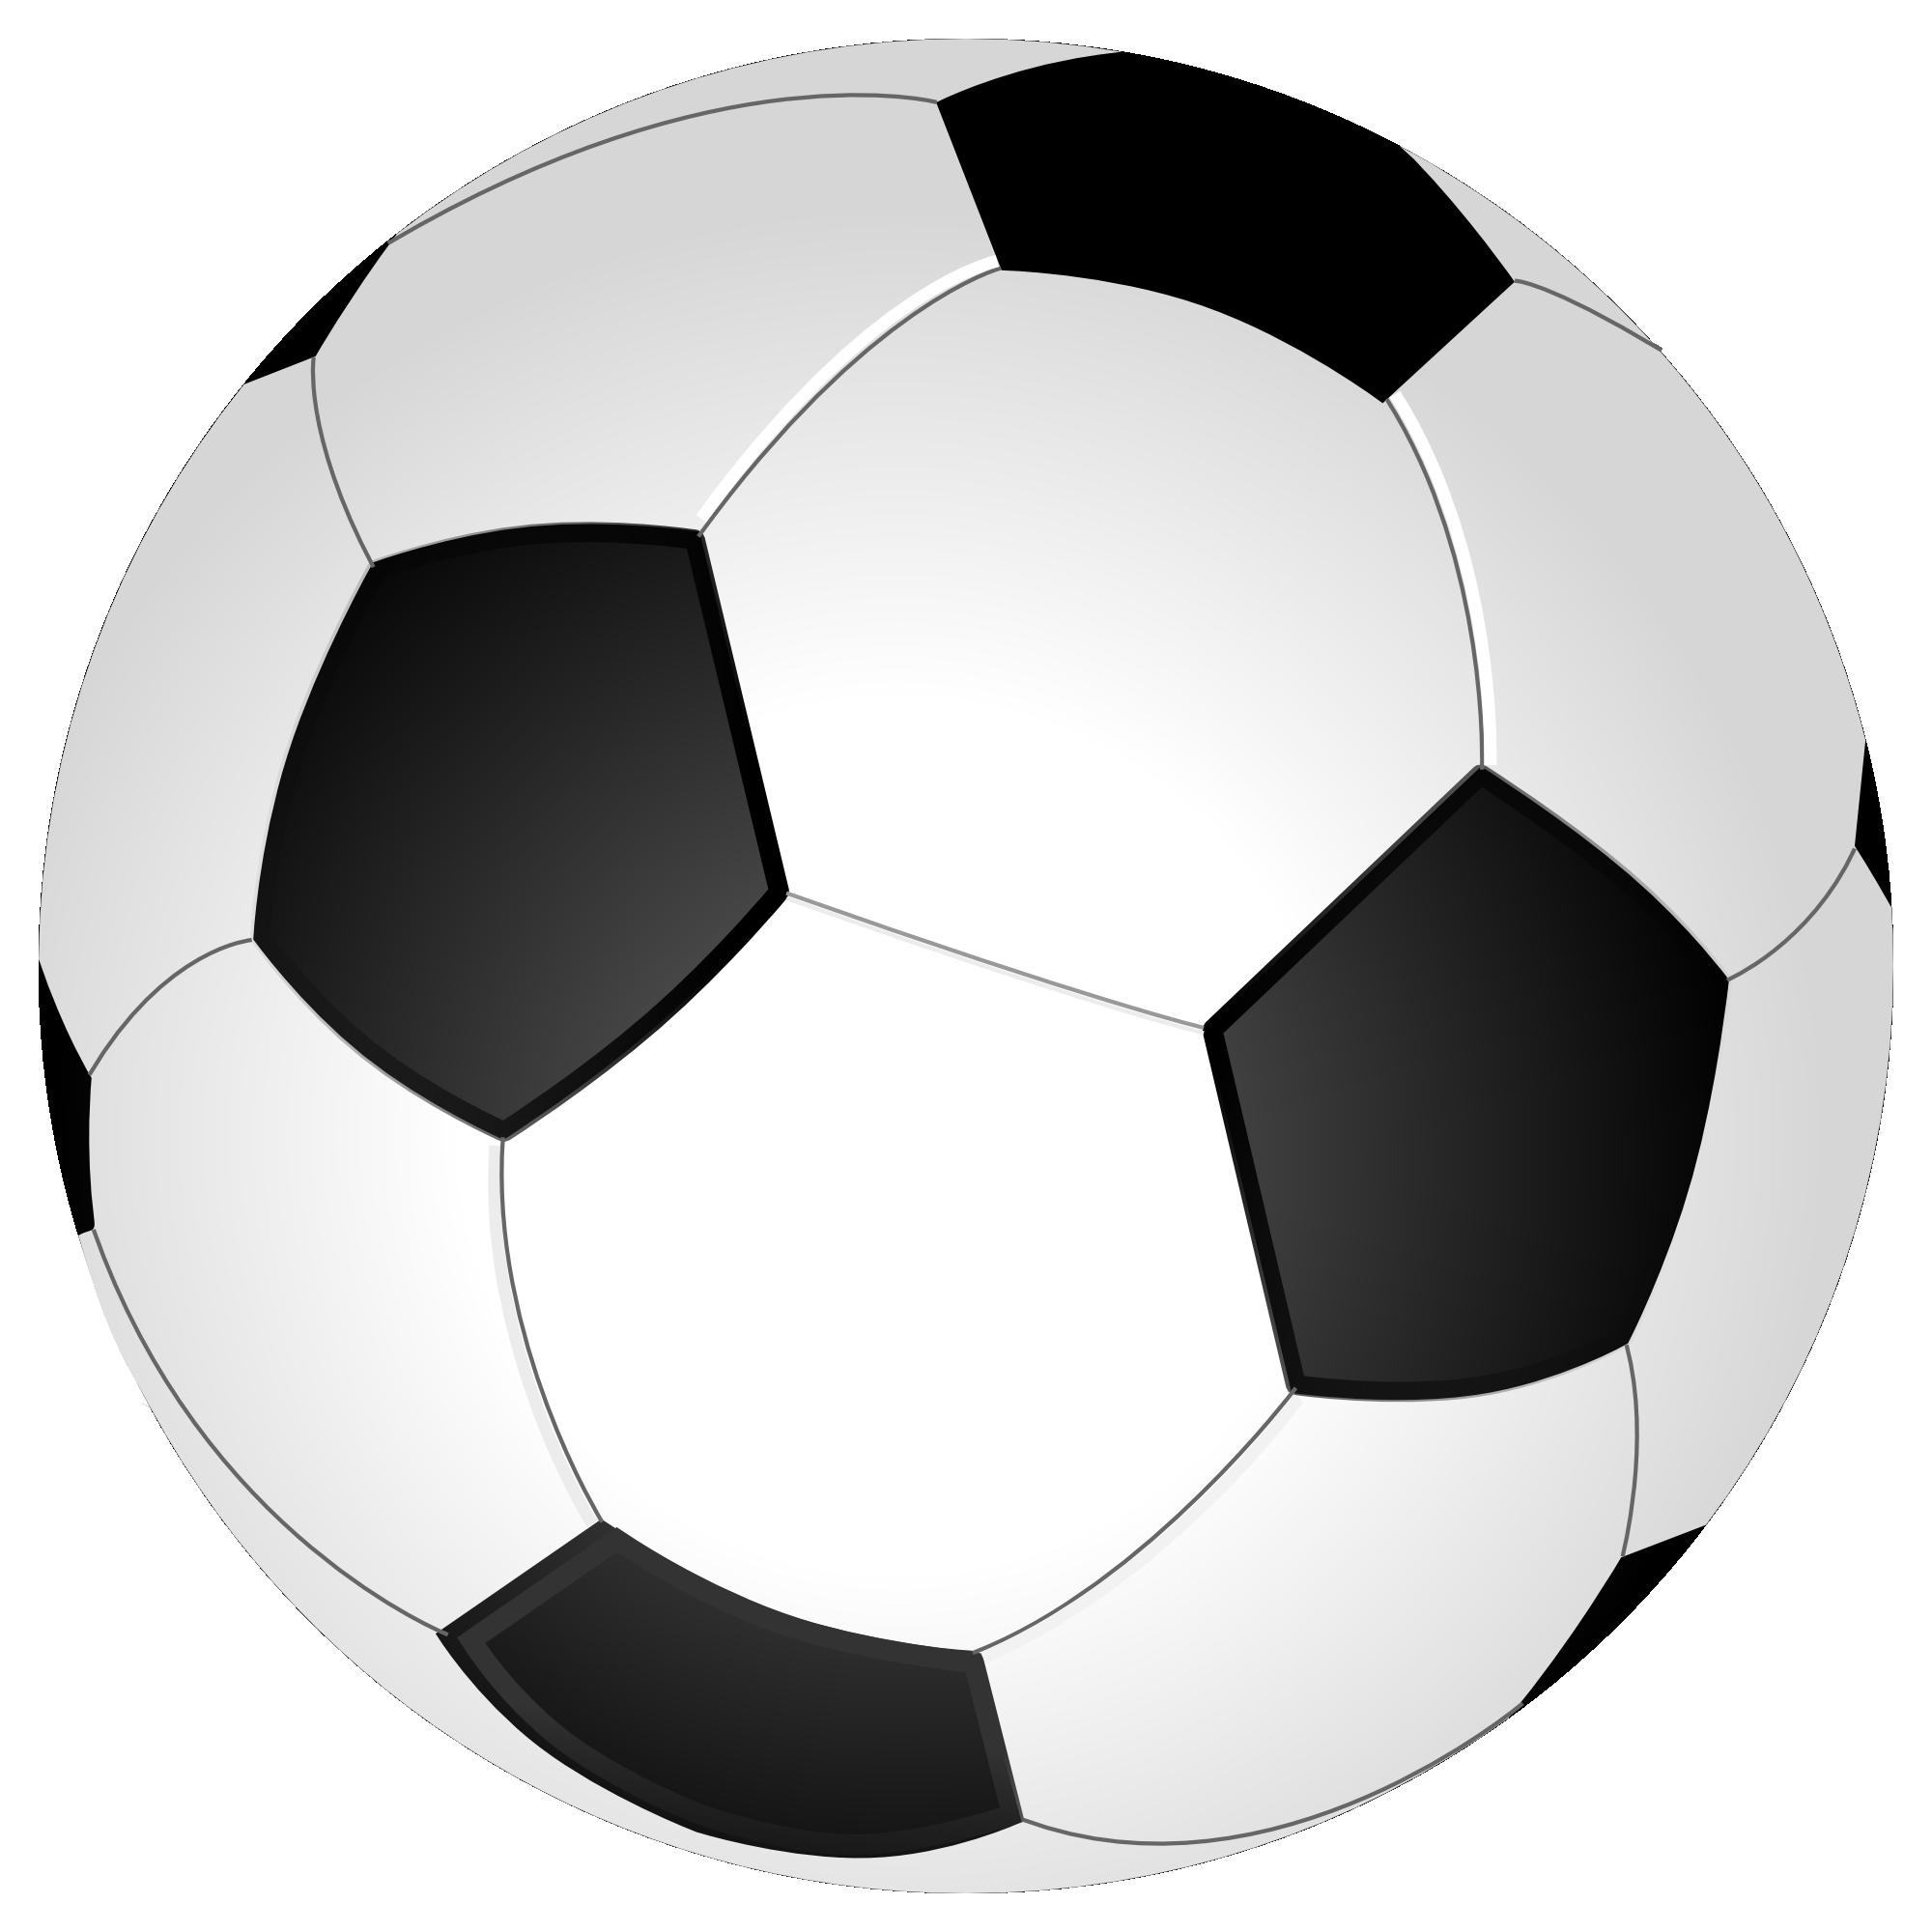 Football vector clipart vector stock Football Vector PNG Transparent Image - PngPix vector stock